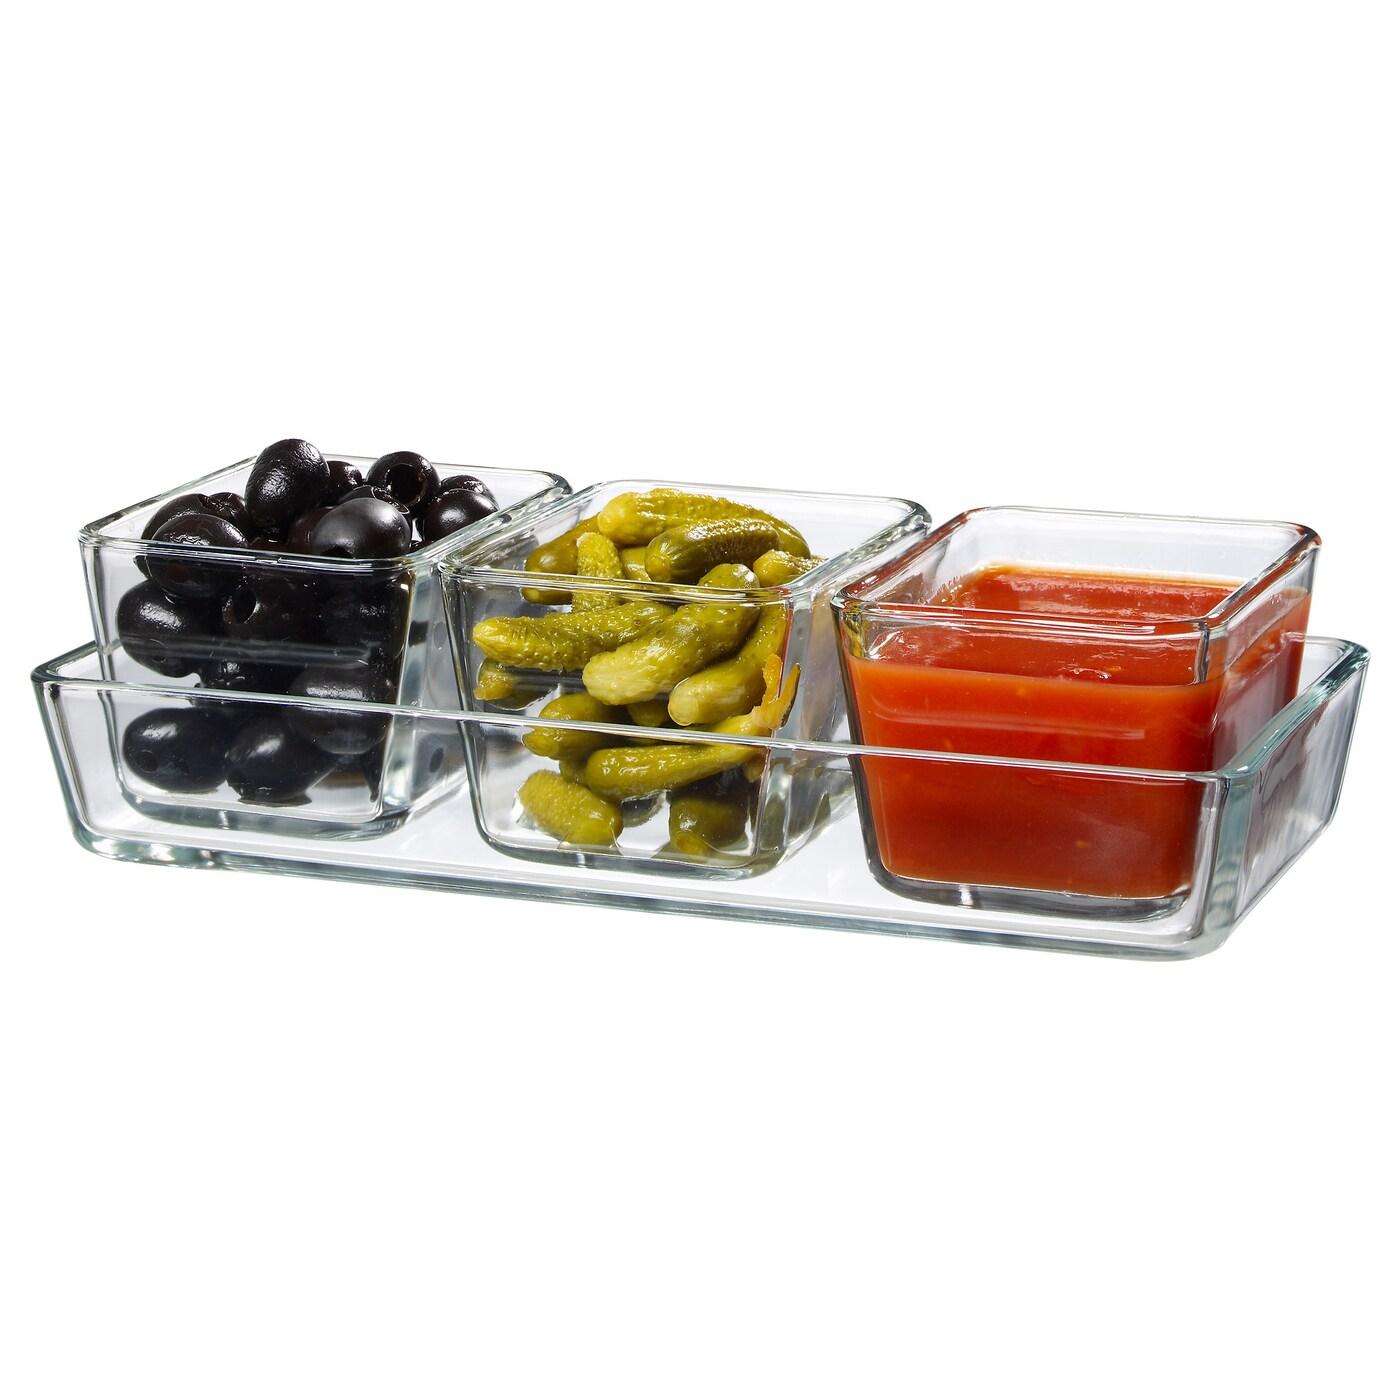 mixtur ramequin plat four lot de 4 verre transparent ikea. Black Bedroom Furniture Sets. Home Design Ideas